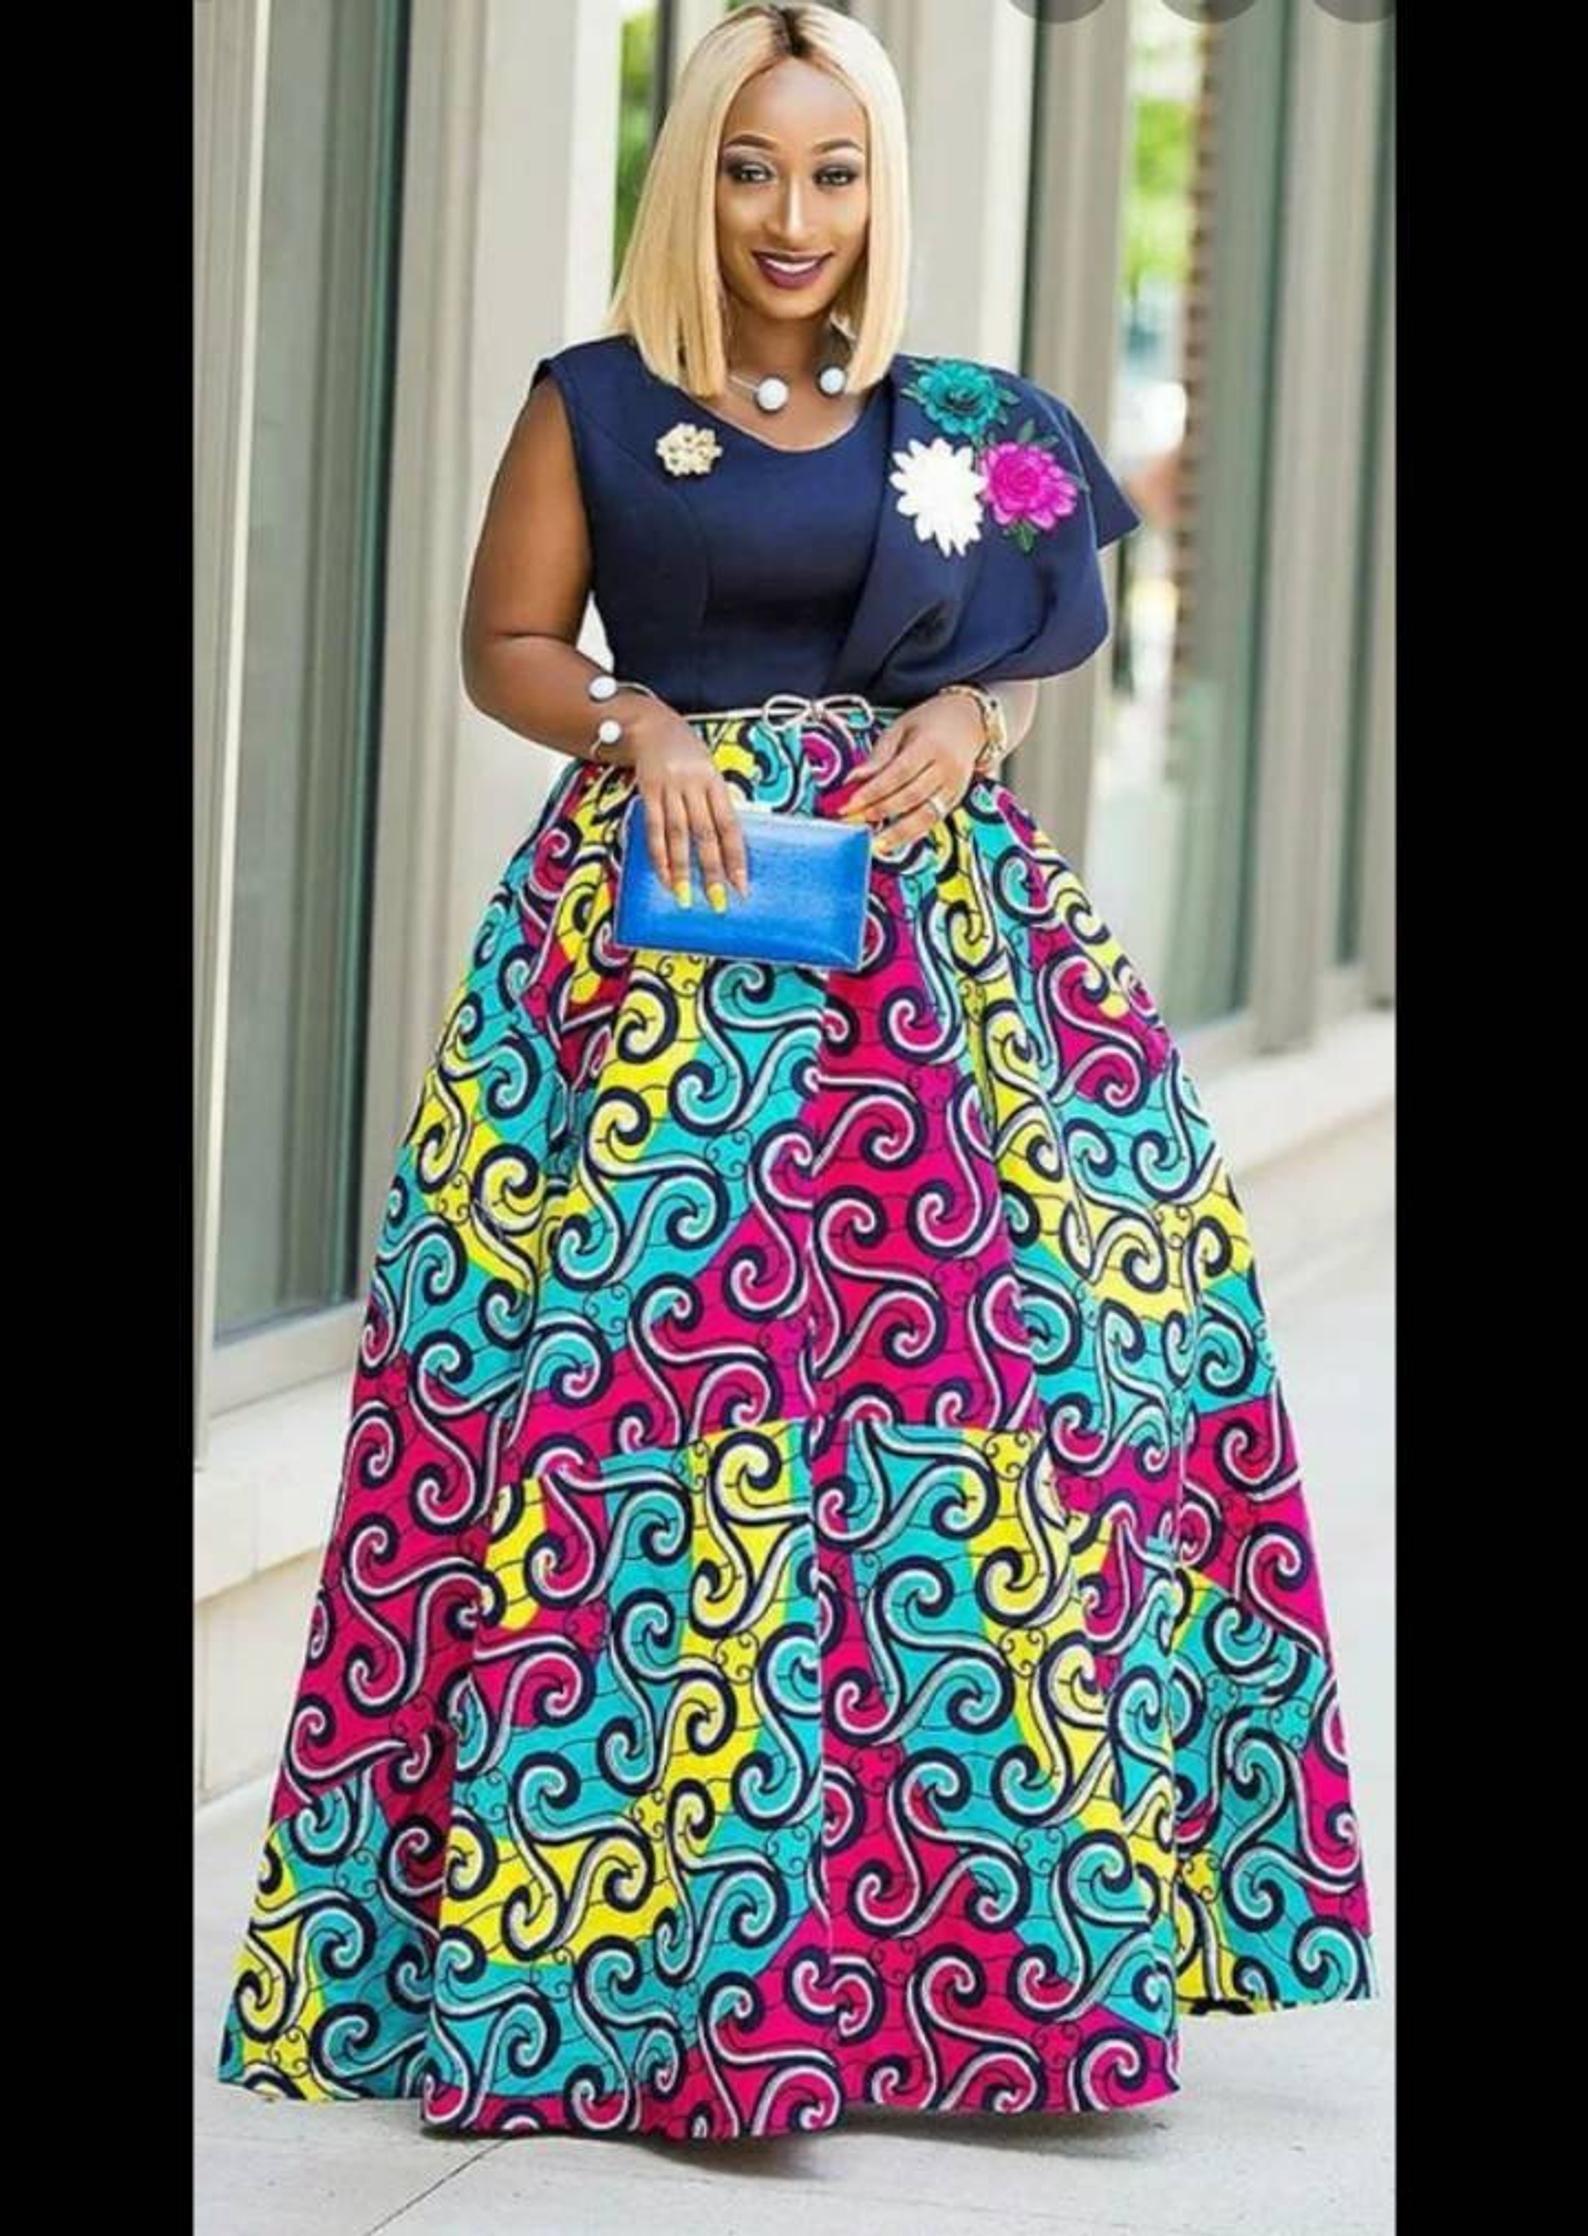 African dress,vintage dress wedding dress,prom dress,2 in 1 African gown,Ankara gown women/'s dress,wedding dress,maxi dress,party gown,